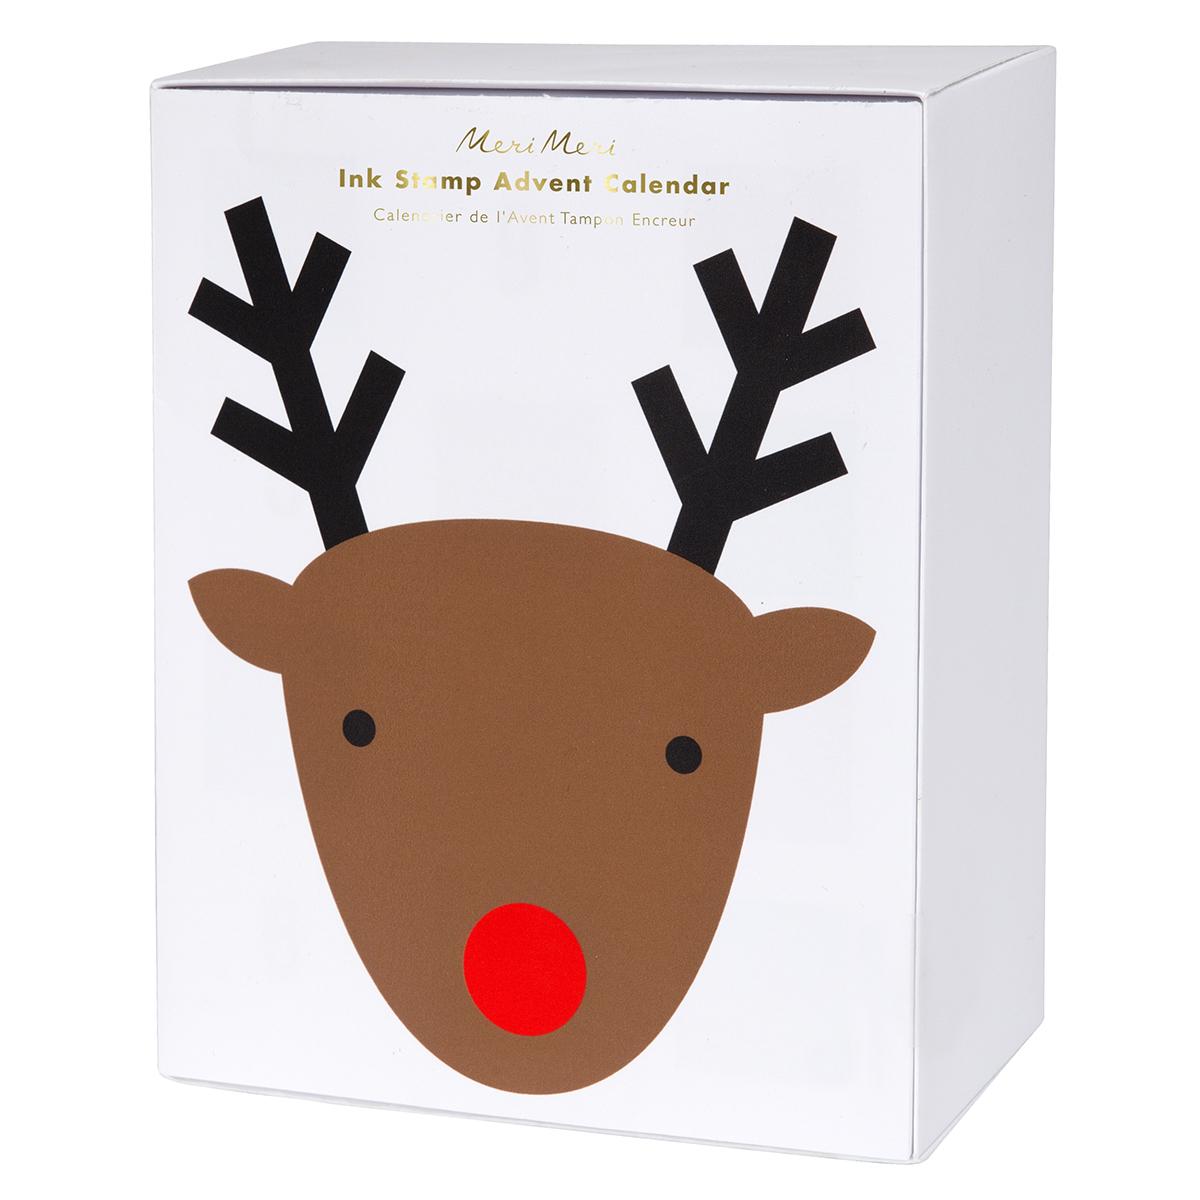 Livre & Carte Calendrier de l'Avent - Tampons de Noël Calendrier de l'Avent - Tampons de Noël